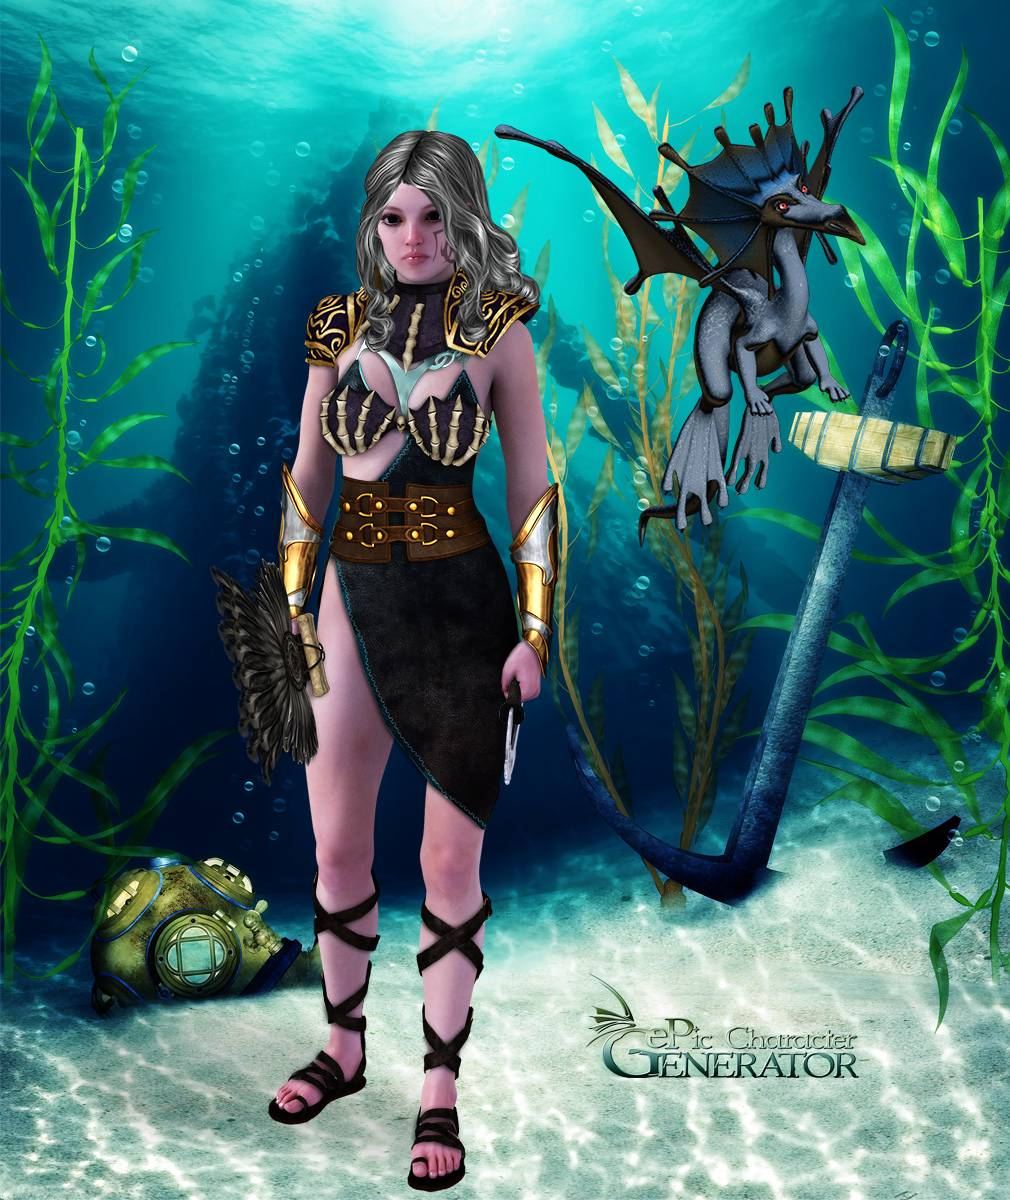 ePic Character Generator Season 2 Fantasy Bestiary Screenshot 01